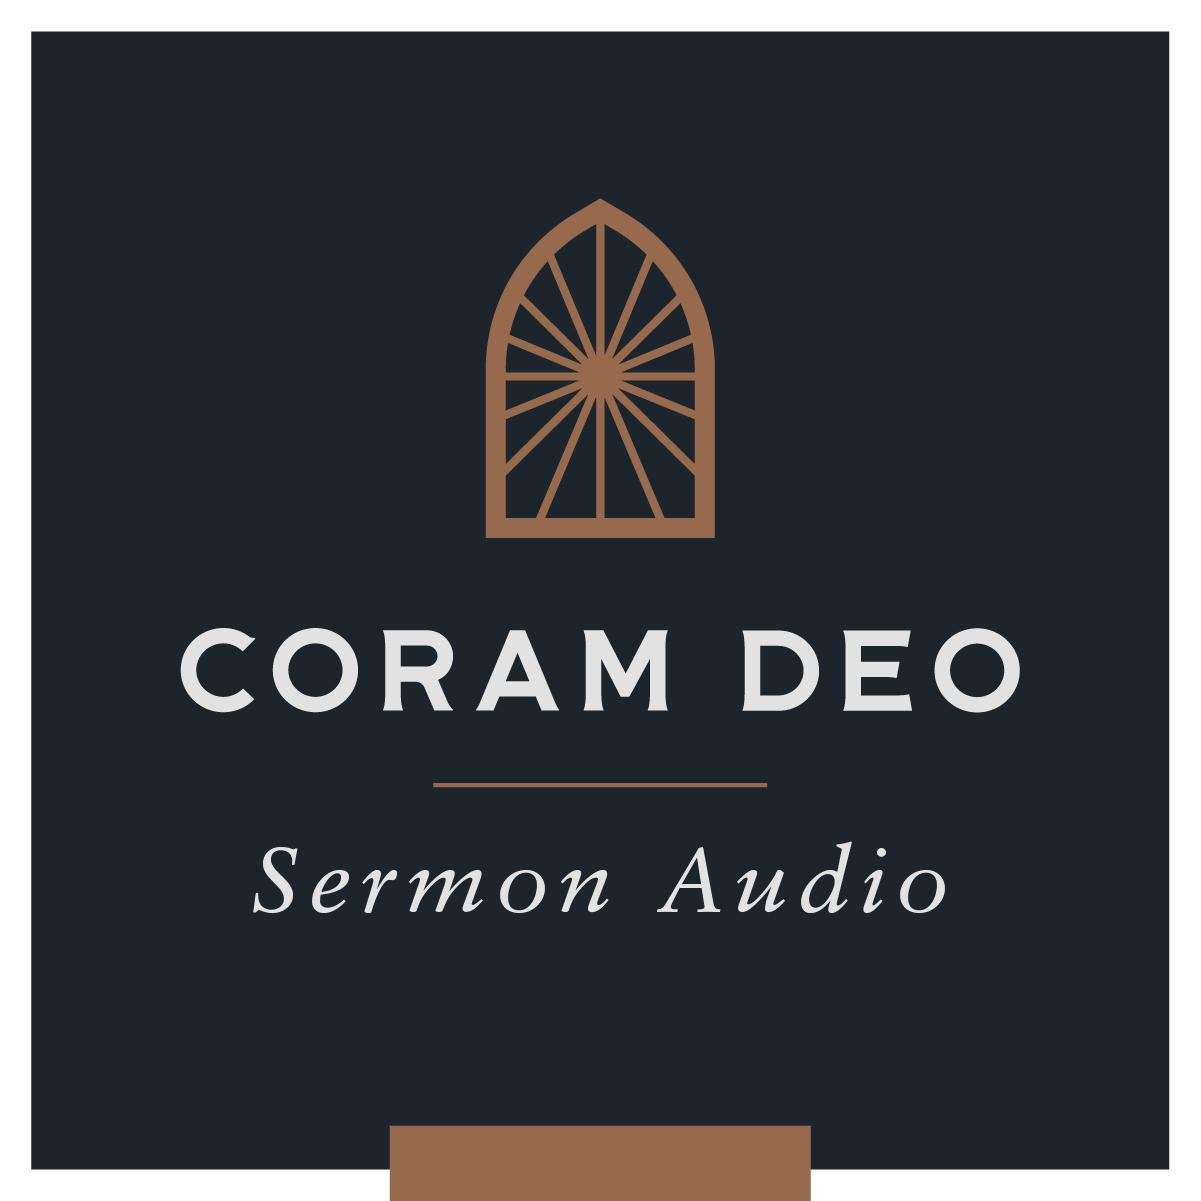 1903_Sermon Audio.jpg